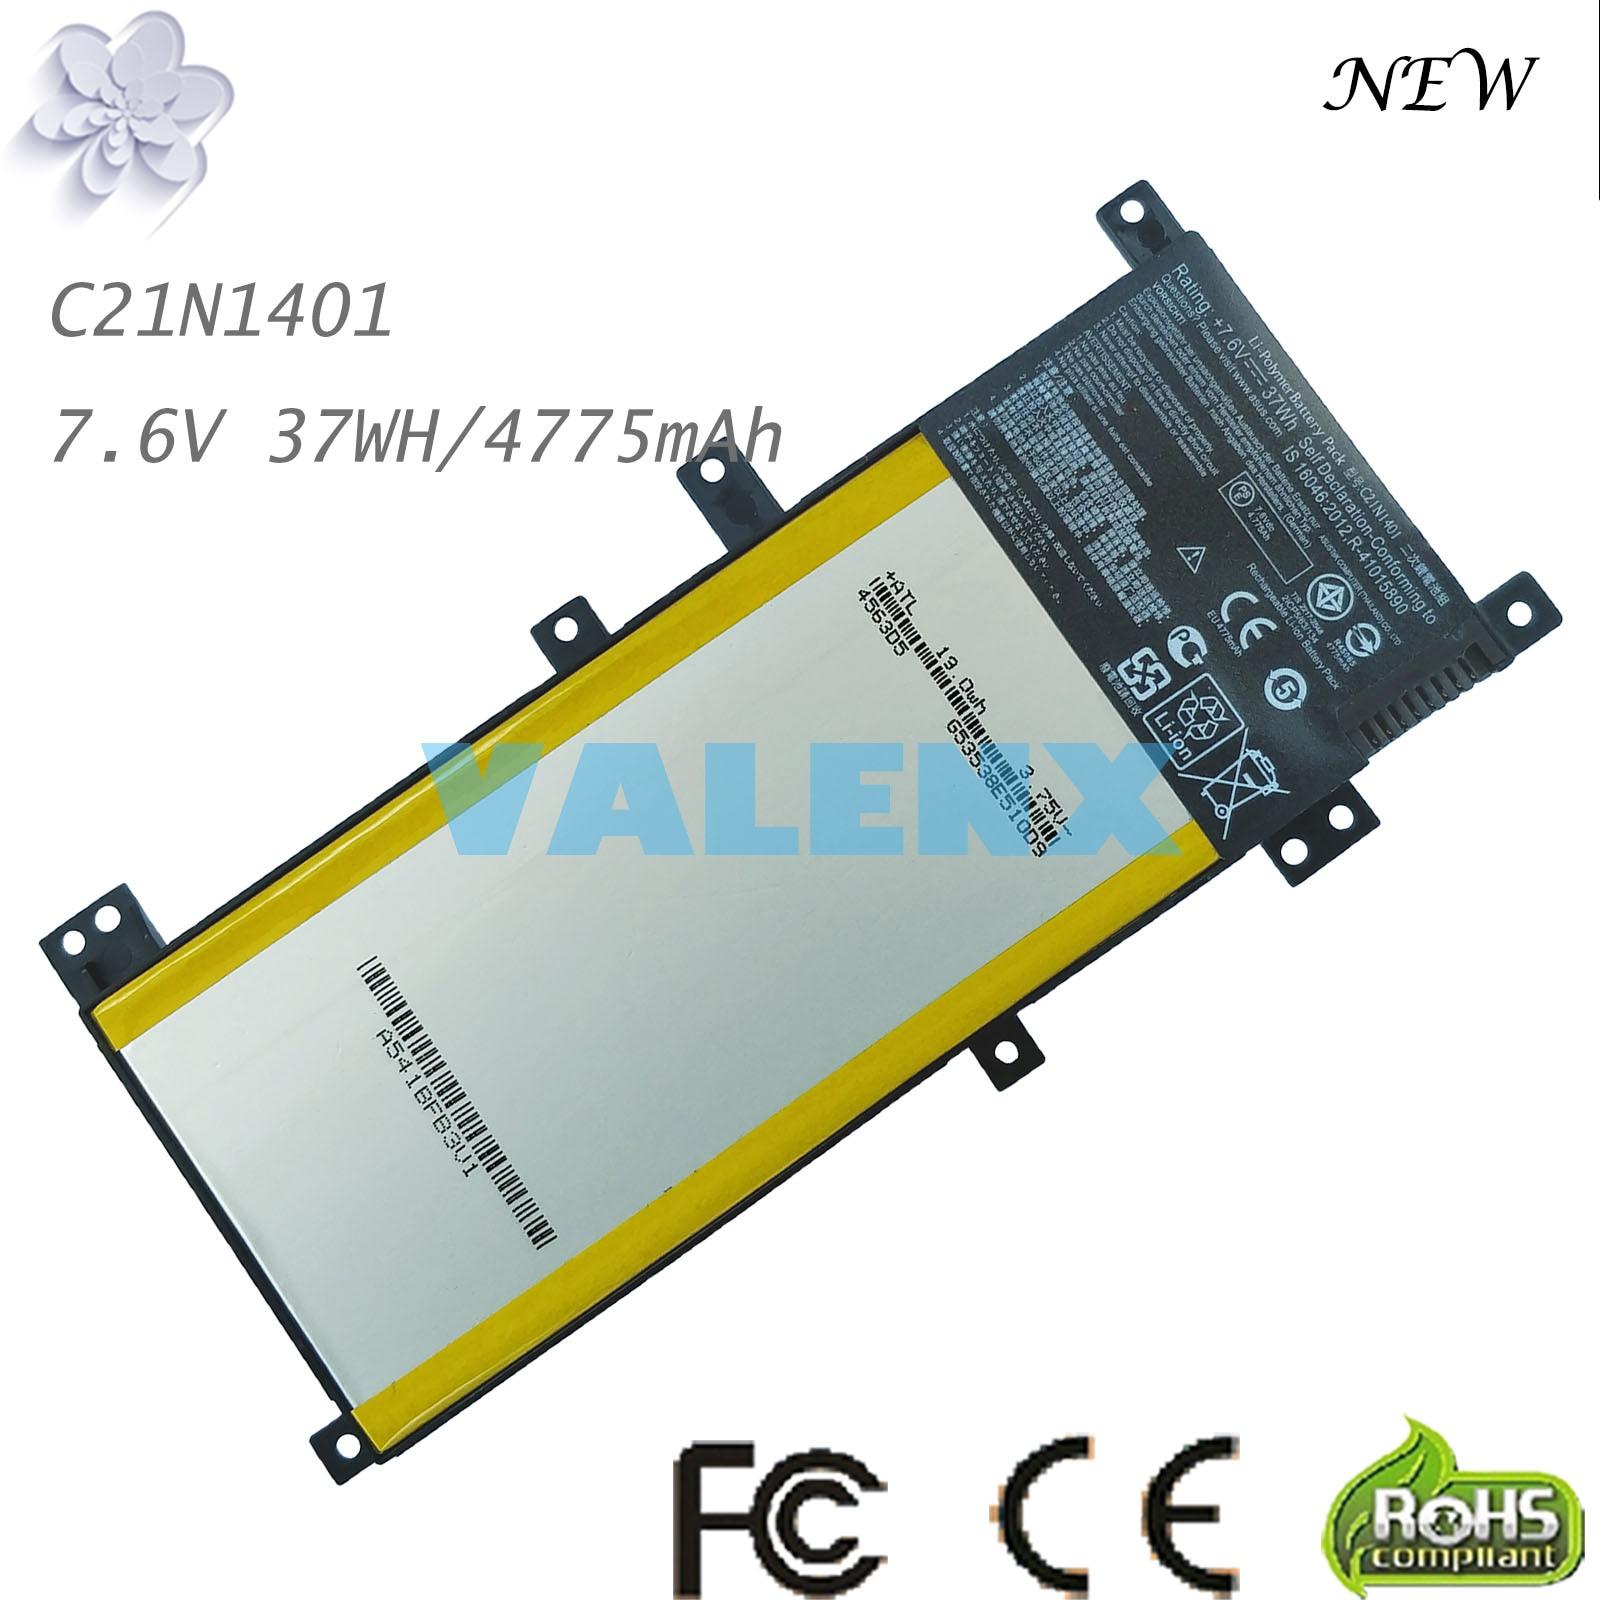 C21N1401 batería para ASUS X455L X455LA X455LD X455LF X455LN F455L F455LD R455LD Y483L Y483LD A556U W419L PP21AT149Q-1